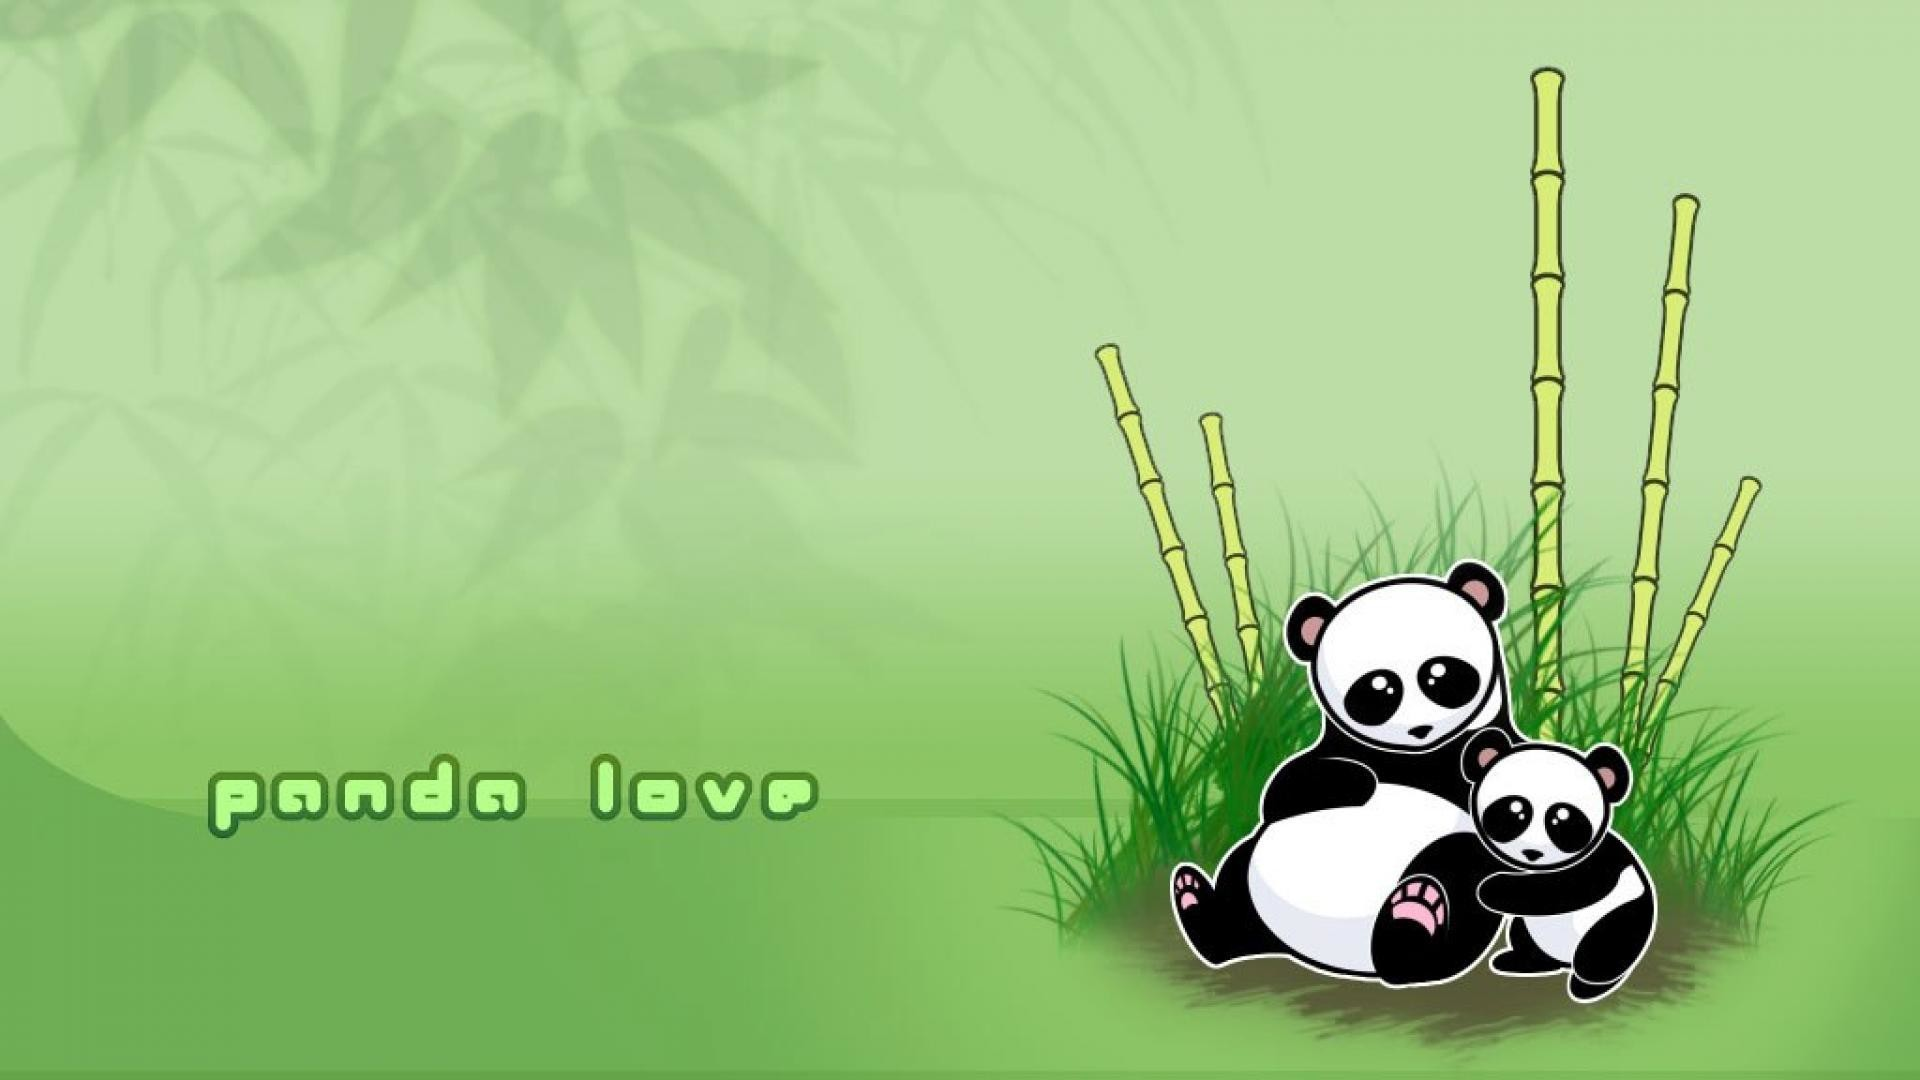 Kawaii tare panda wallpaper wallpapertag - Kawaii wallpaper hd ...